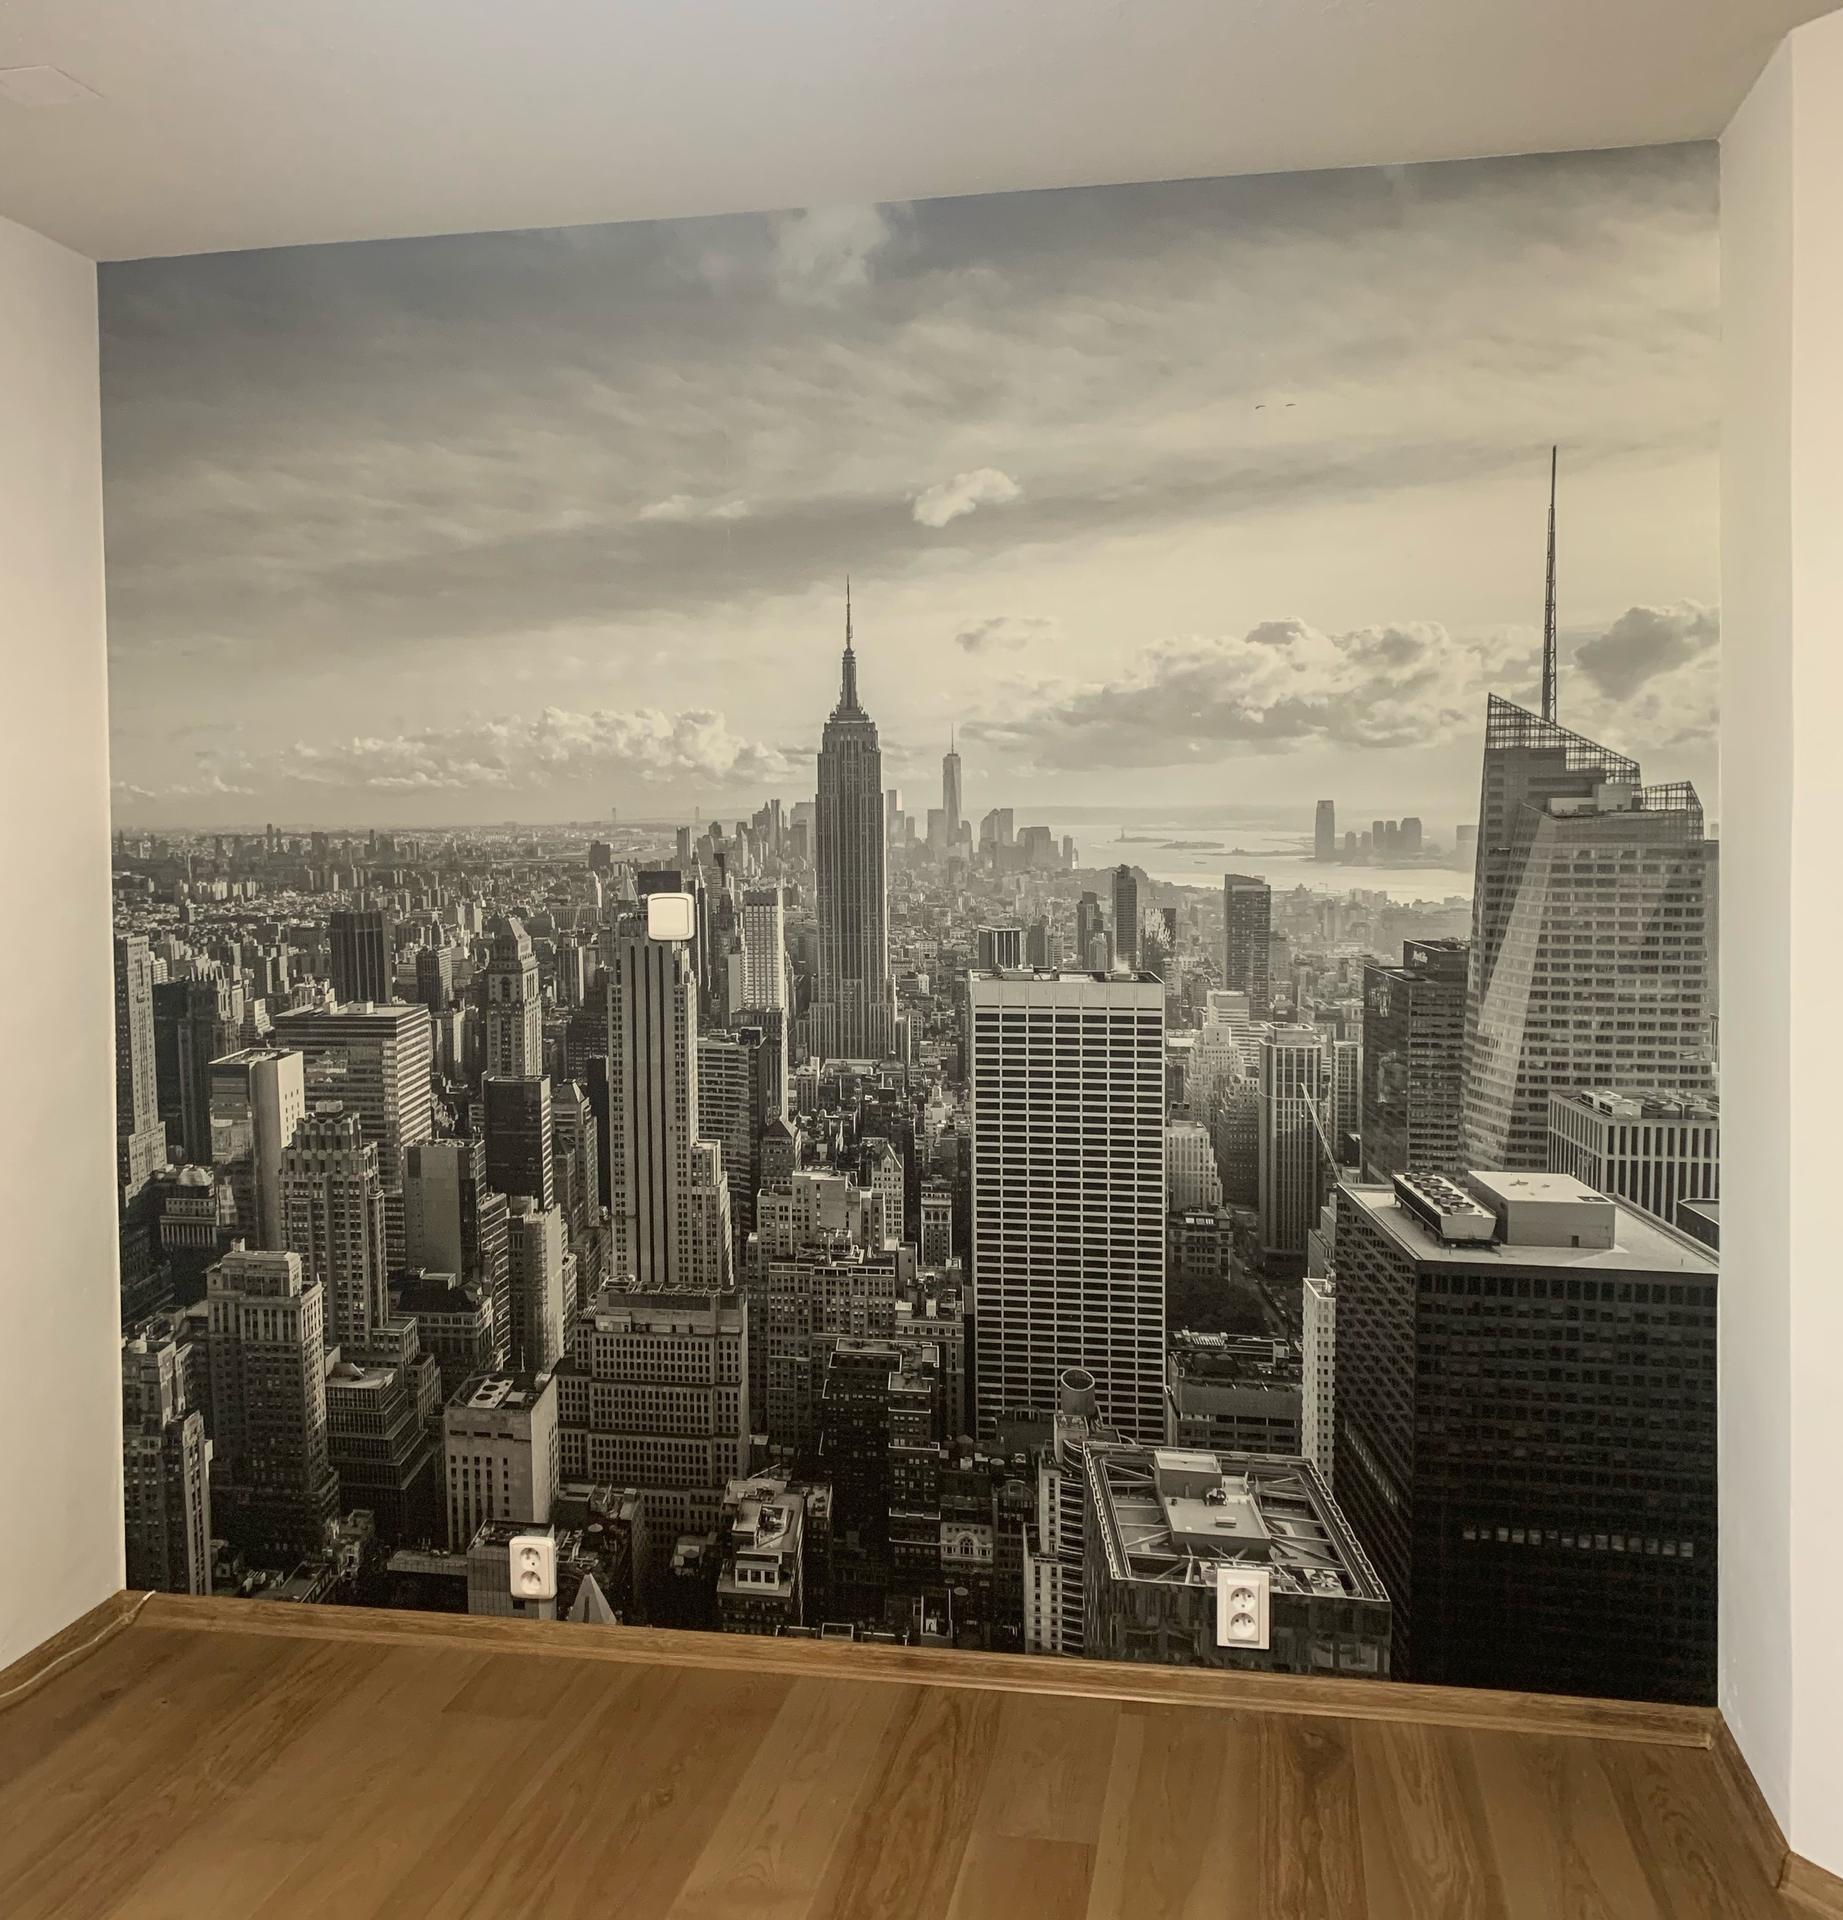 Fototapety - realizace zakázek - vinylová fototapeta New York, 272x250cm